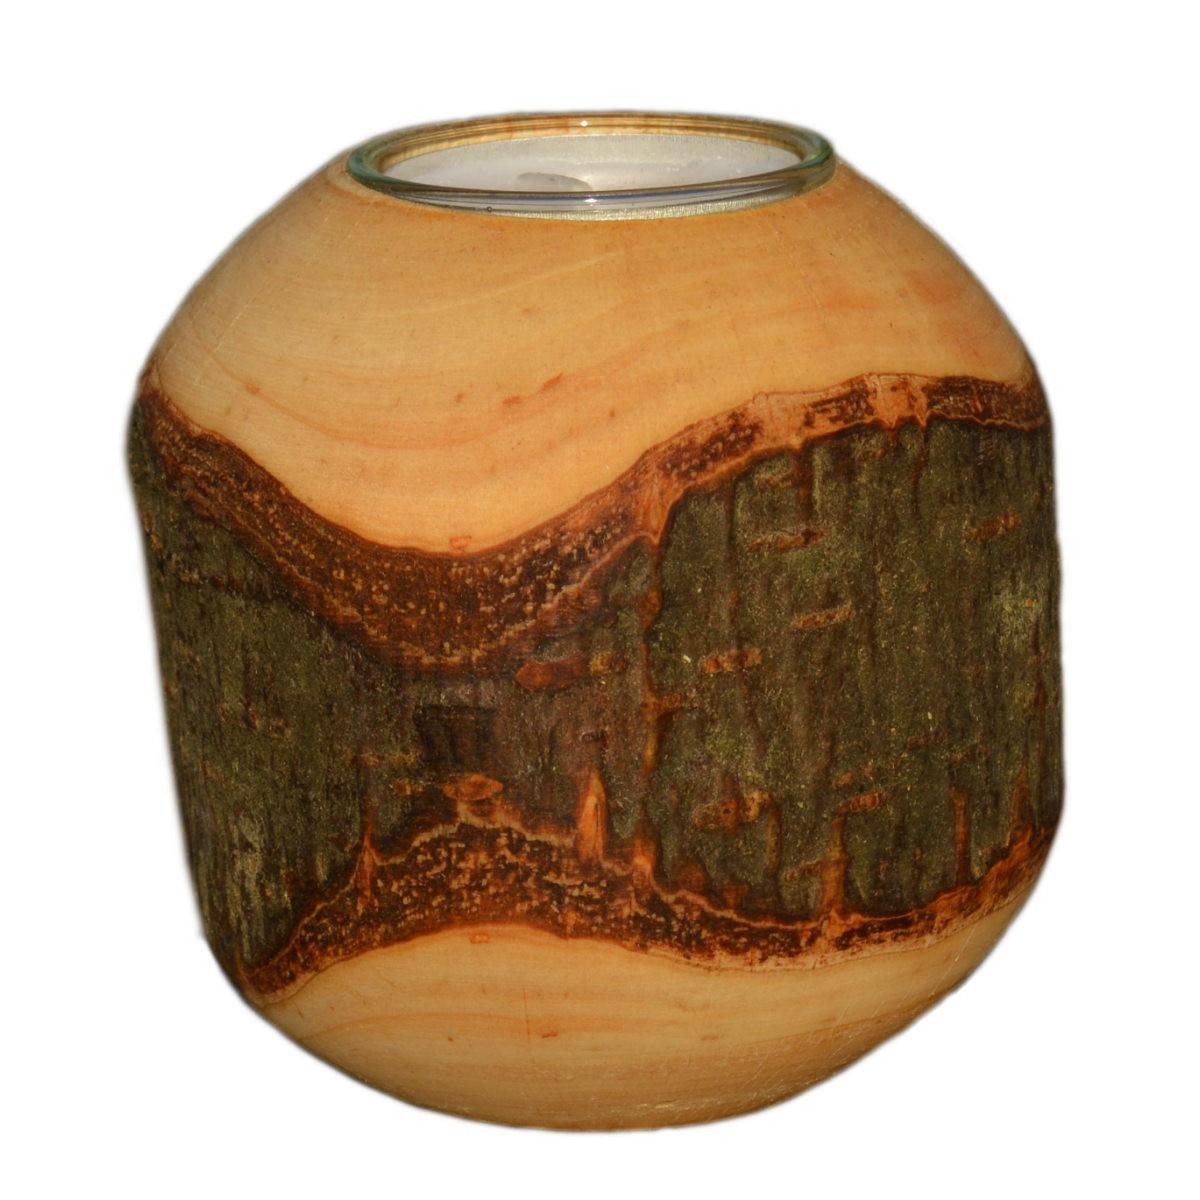 Rinden Teelichthalter, Kugel mittel Ø 9cm - Deko Teelichtkugel Holz